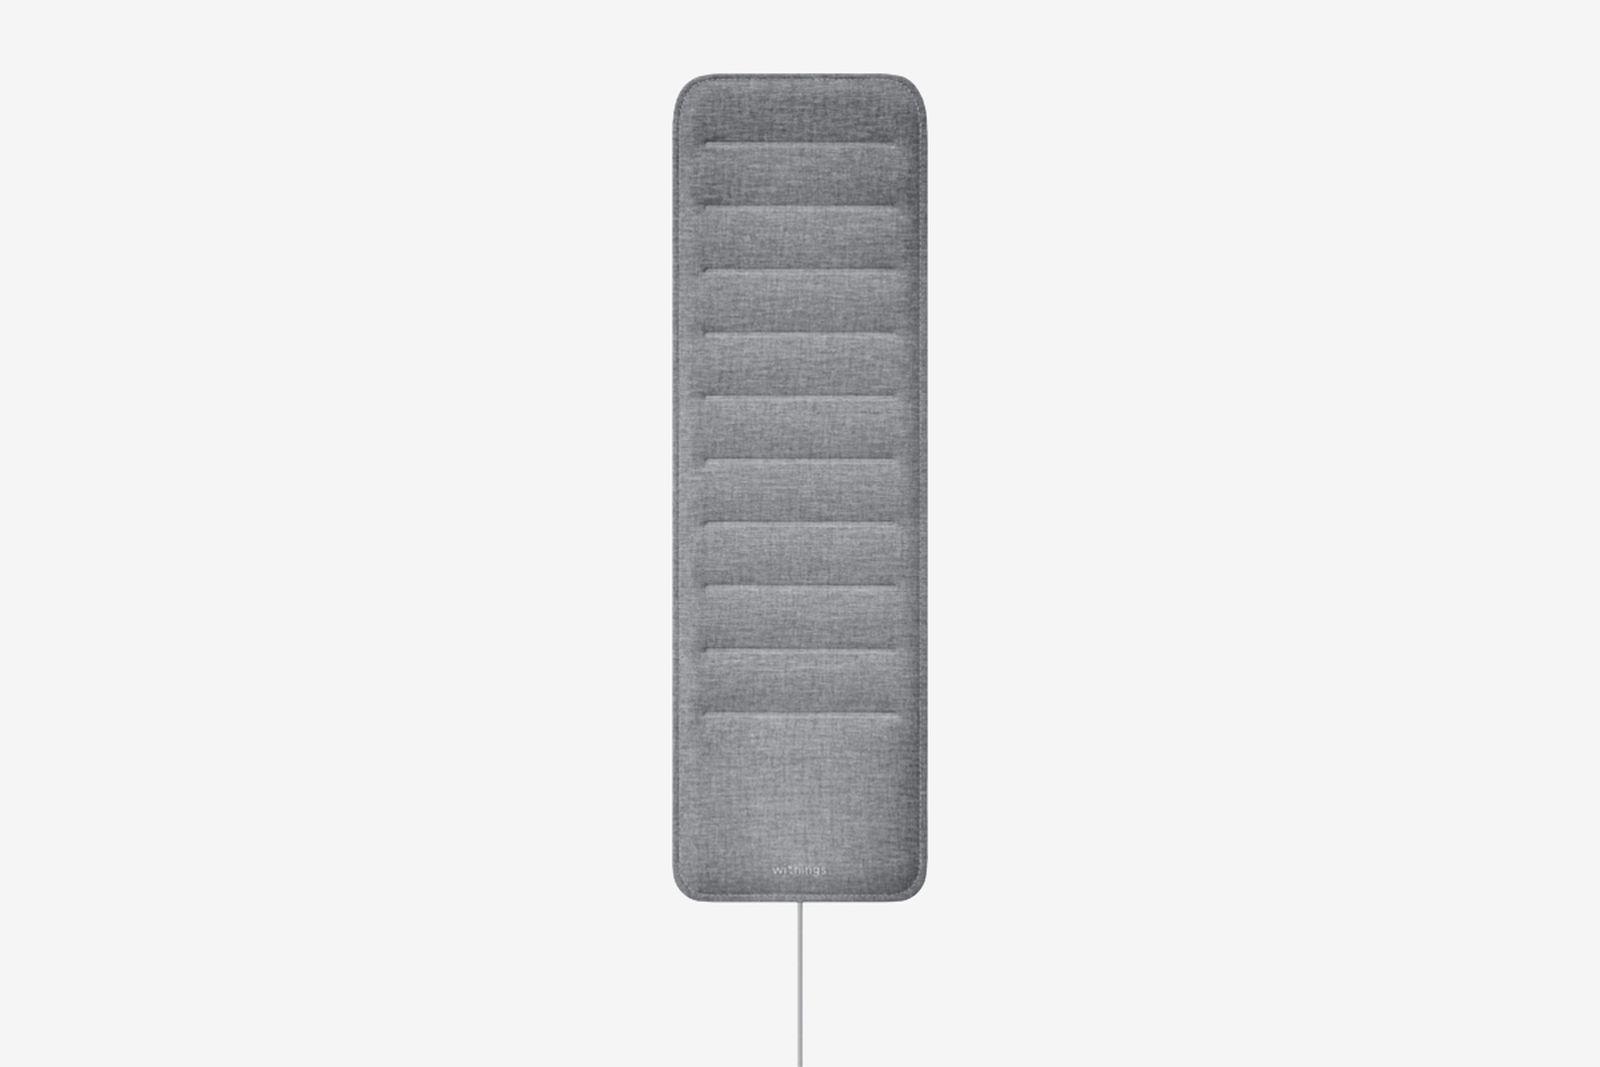 sleep enhancing tech 000 amazon muji nokia